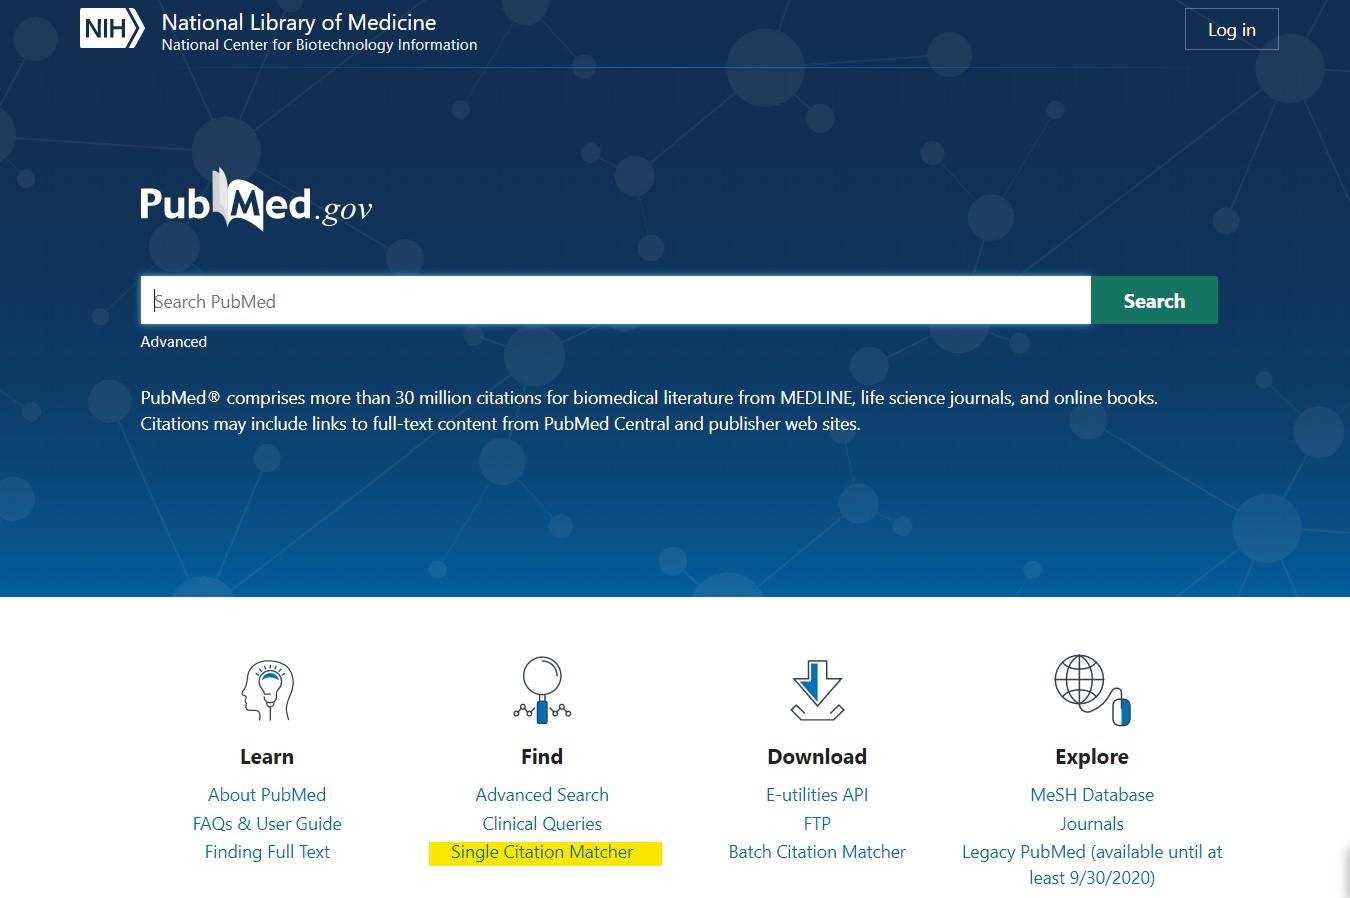 The PubMed Single Citation Matcher link